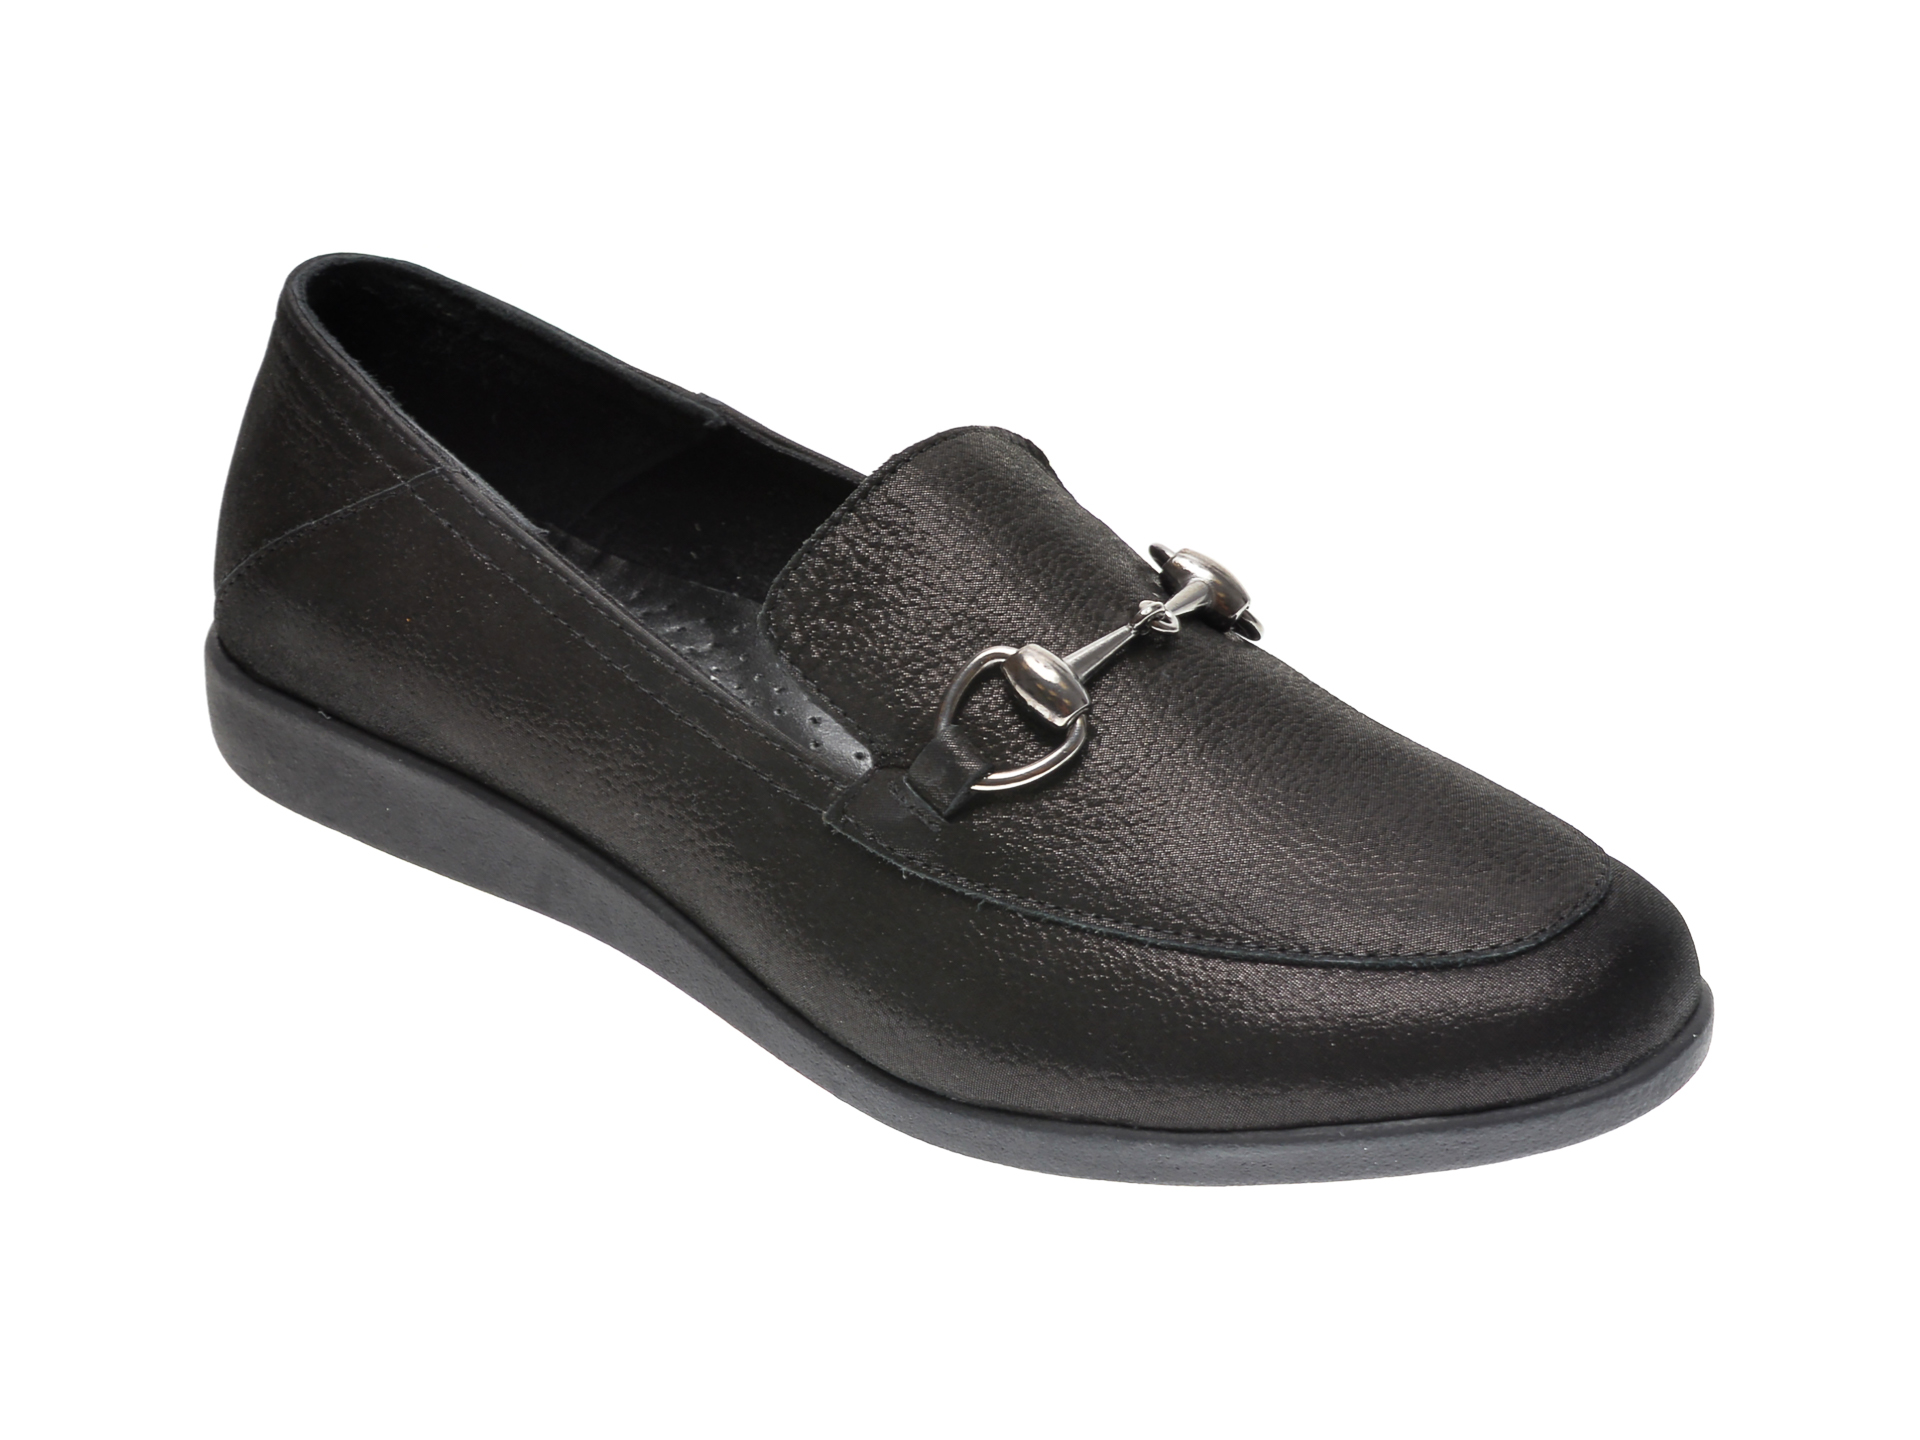 Pantofi ILOZ negri, 1, din piele naturala imagine